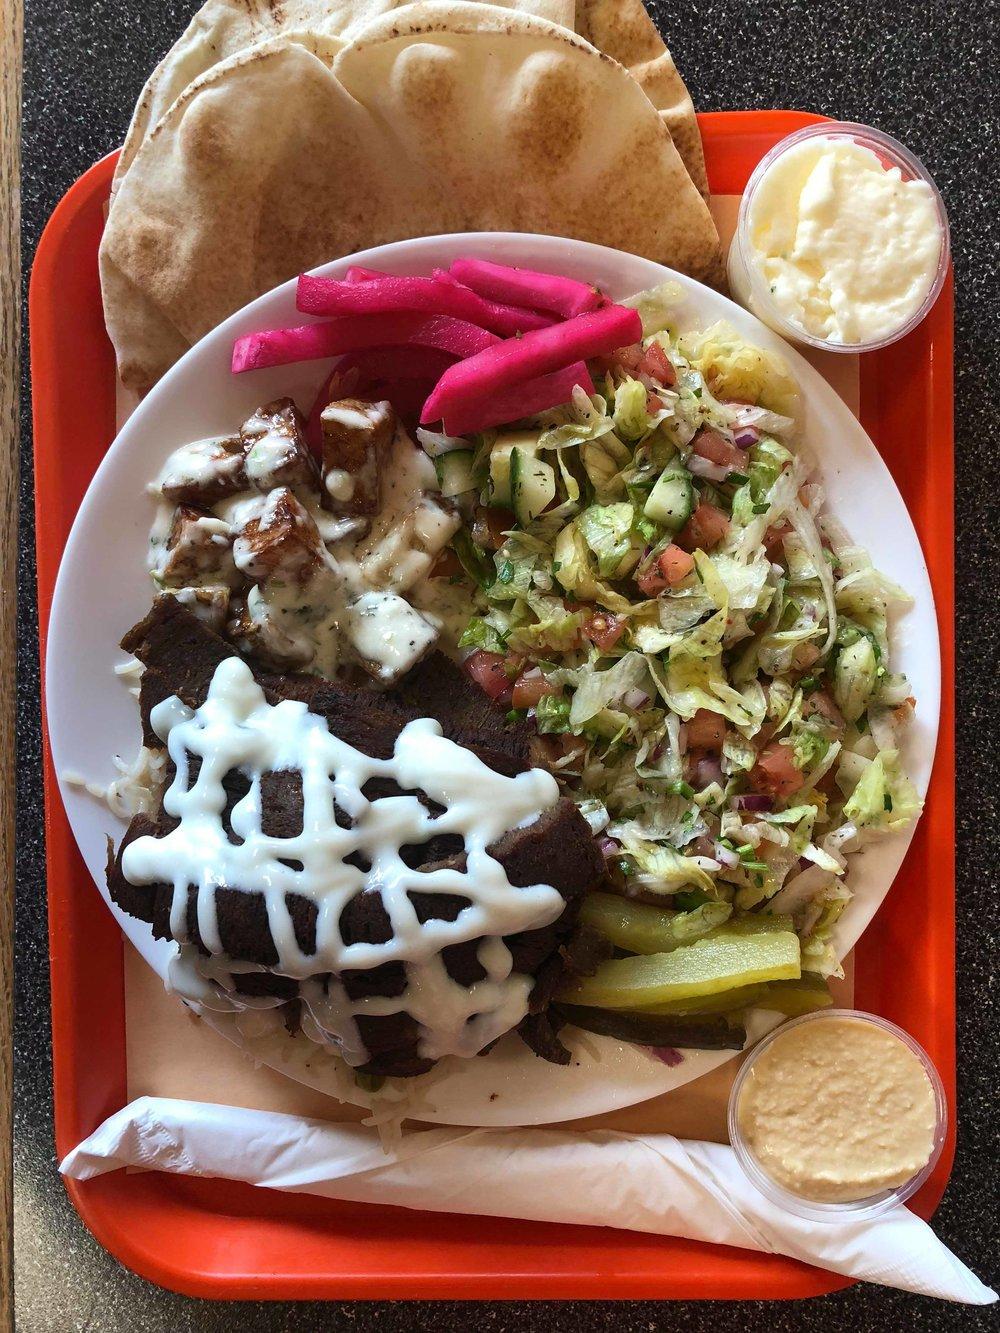 DINNERS - All Dinners include:Garlic Potatoes, Rice, Salad, Pita, Garlic & Hummus dipCHICKEN SHAWARMA      - $14.99DONAIR            - $13.99MIX PLATTER (Donair & Chicken) - $14.99FALAFEL           - $13.99SOUVLAKI          - $13.99